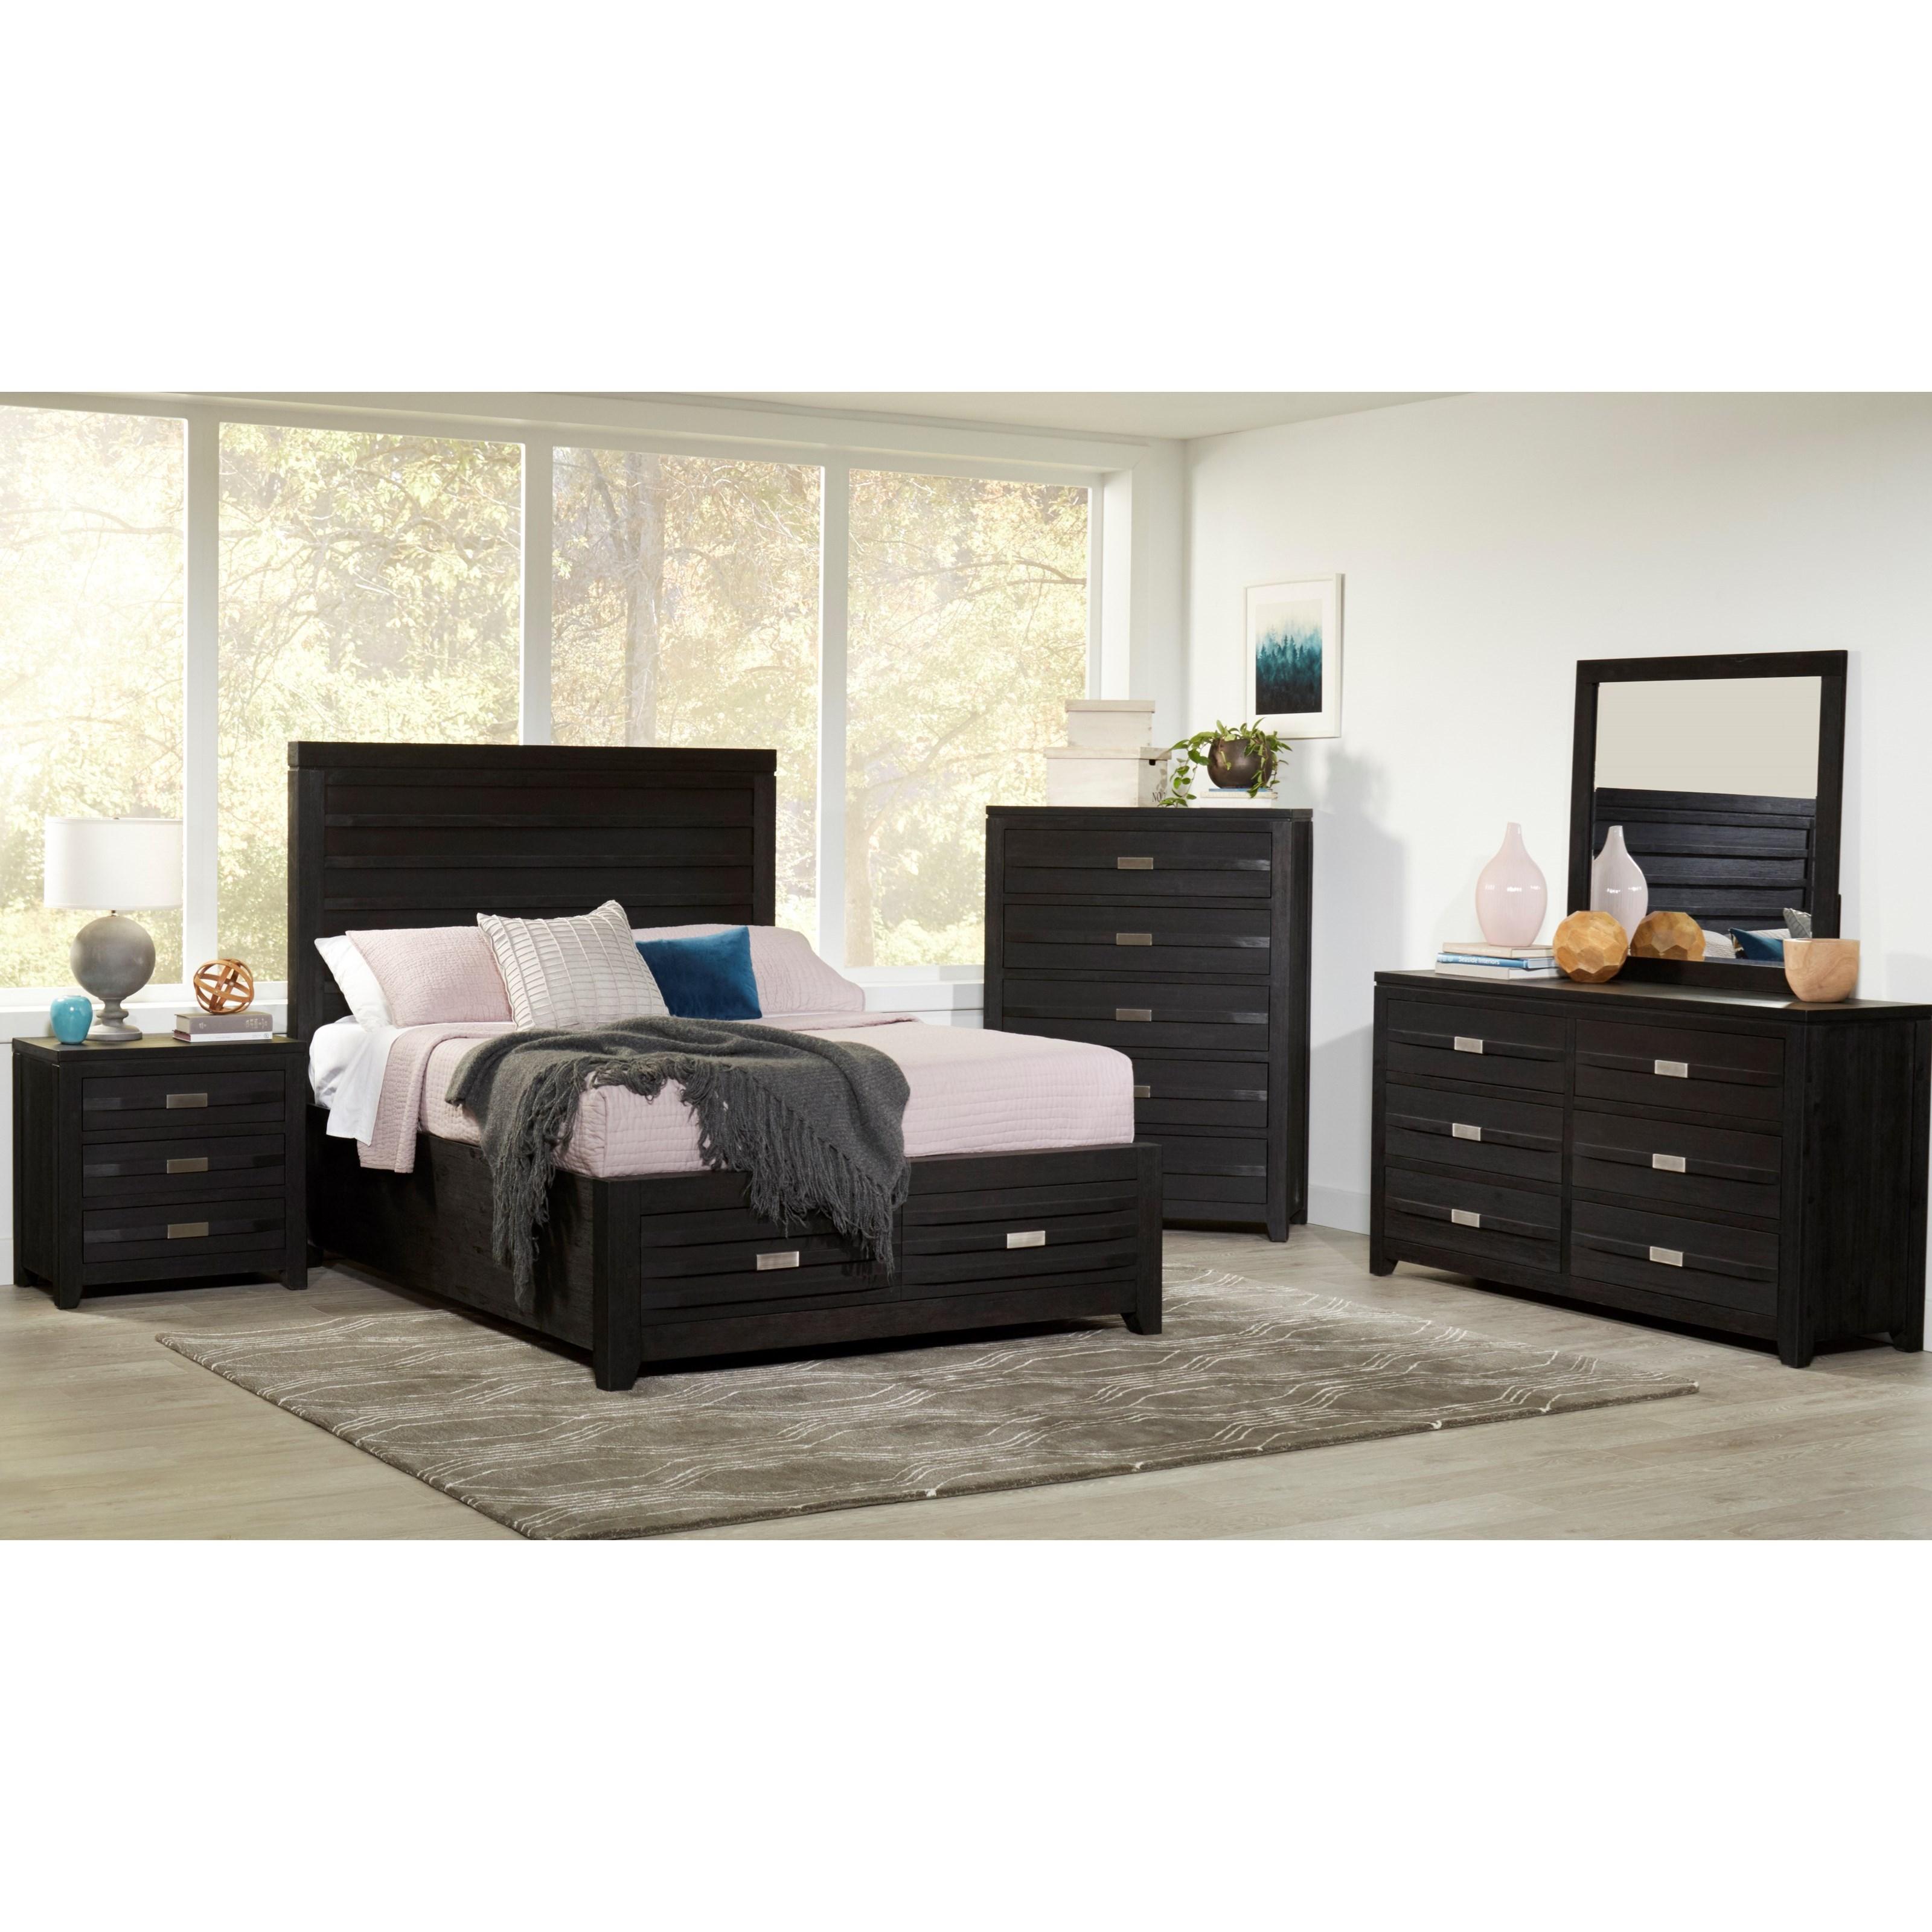 Altamonte King Bedroom Group by Jofran at Lapeer Furniture & Mattress Center